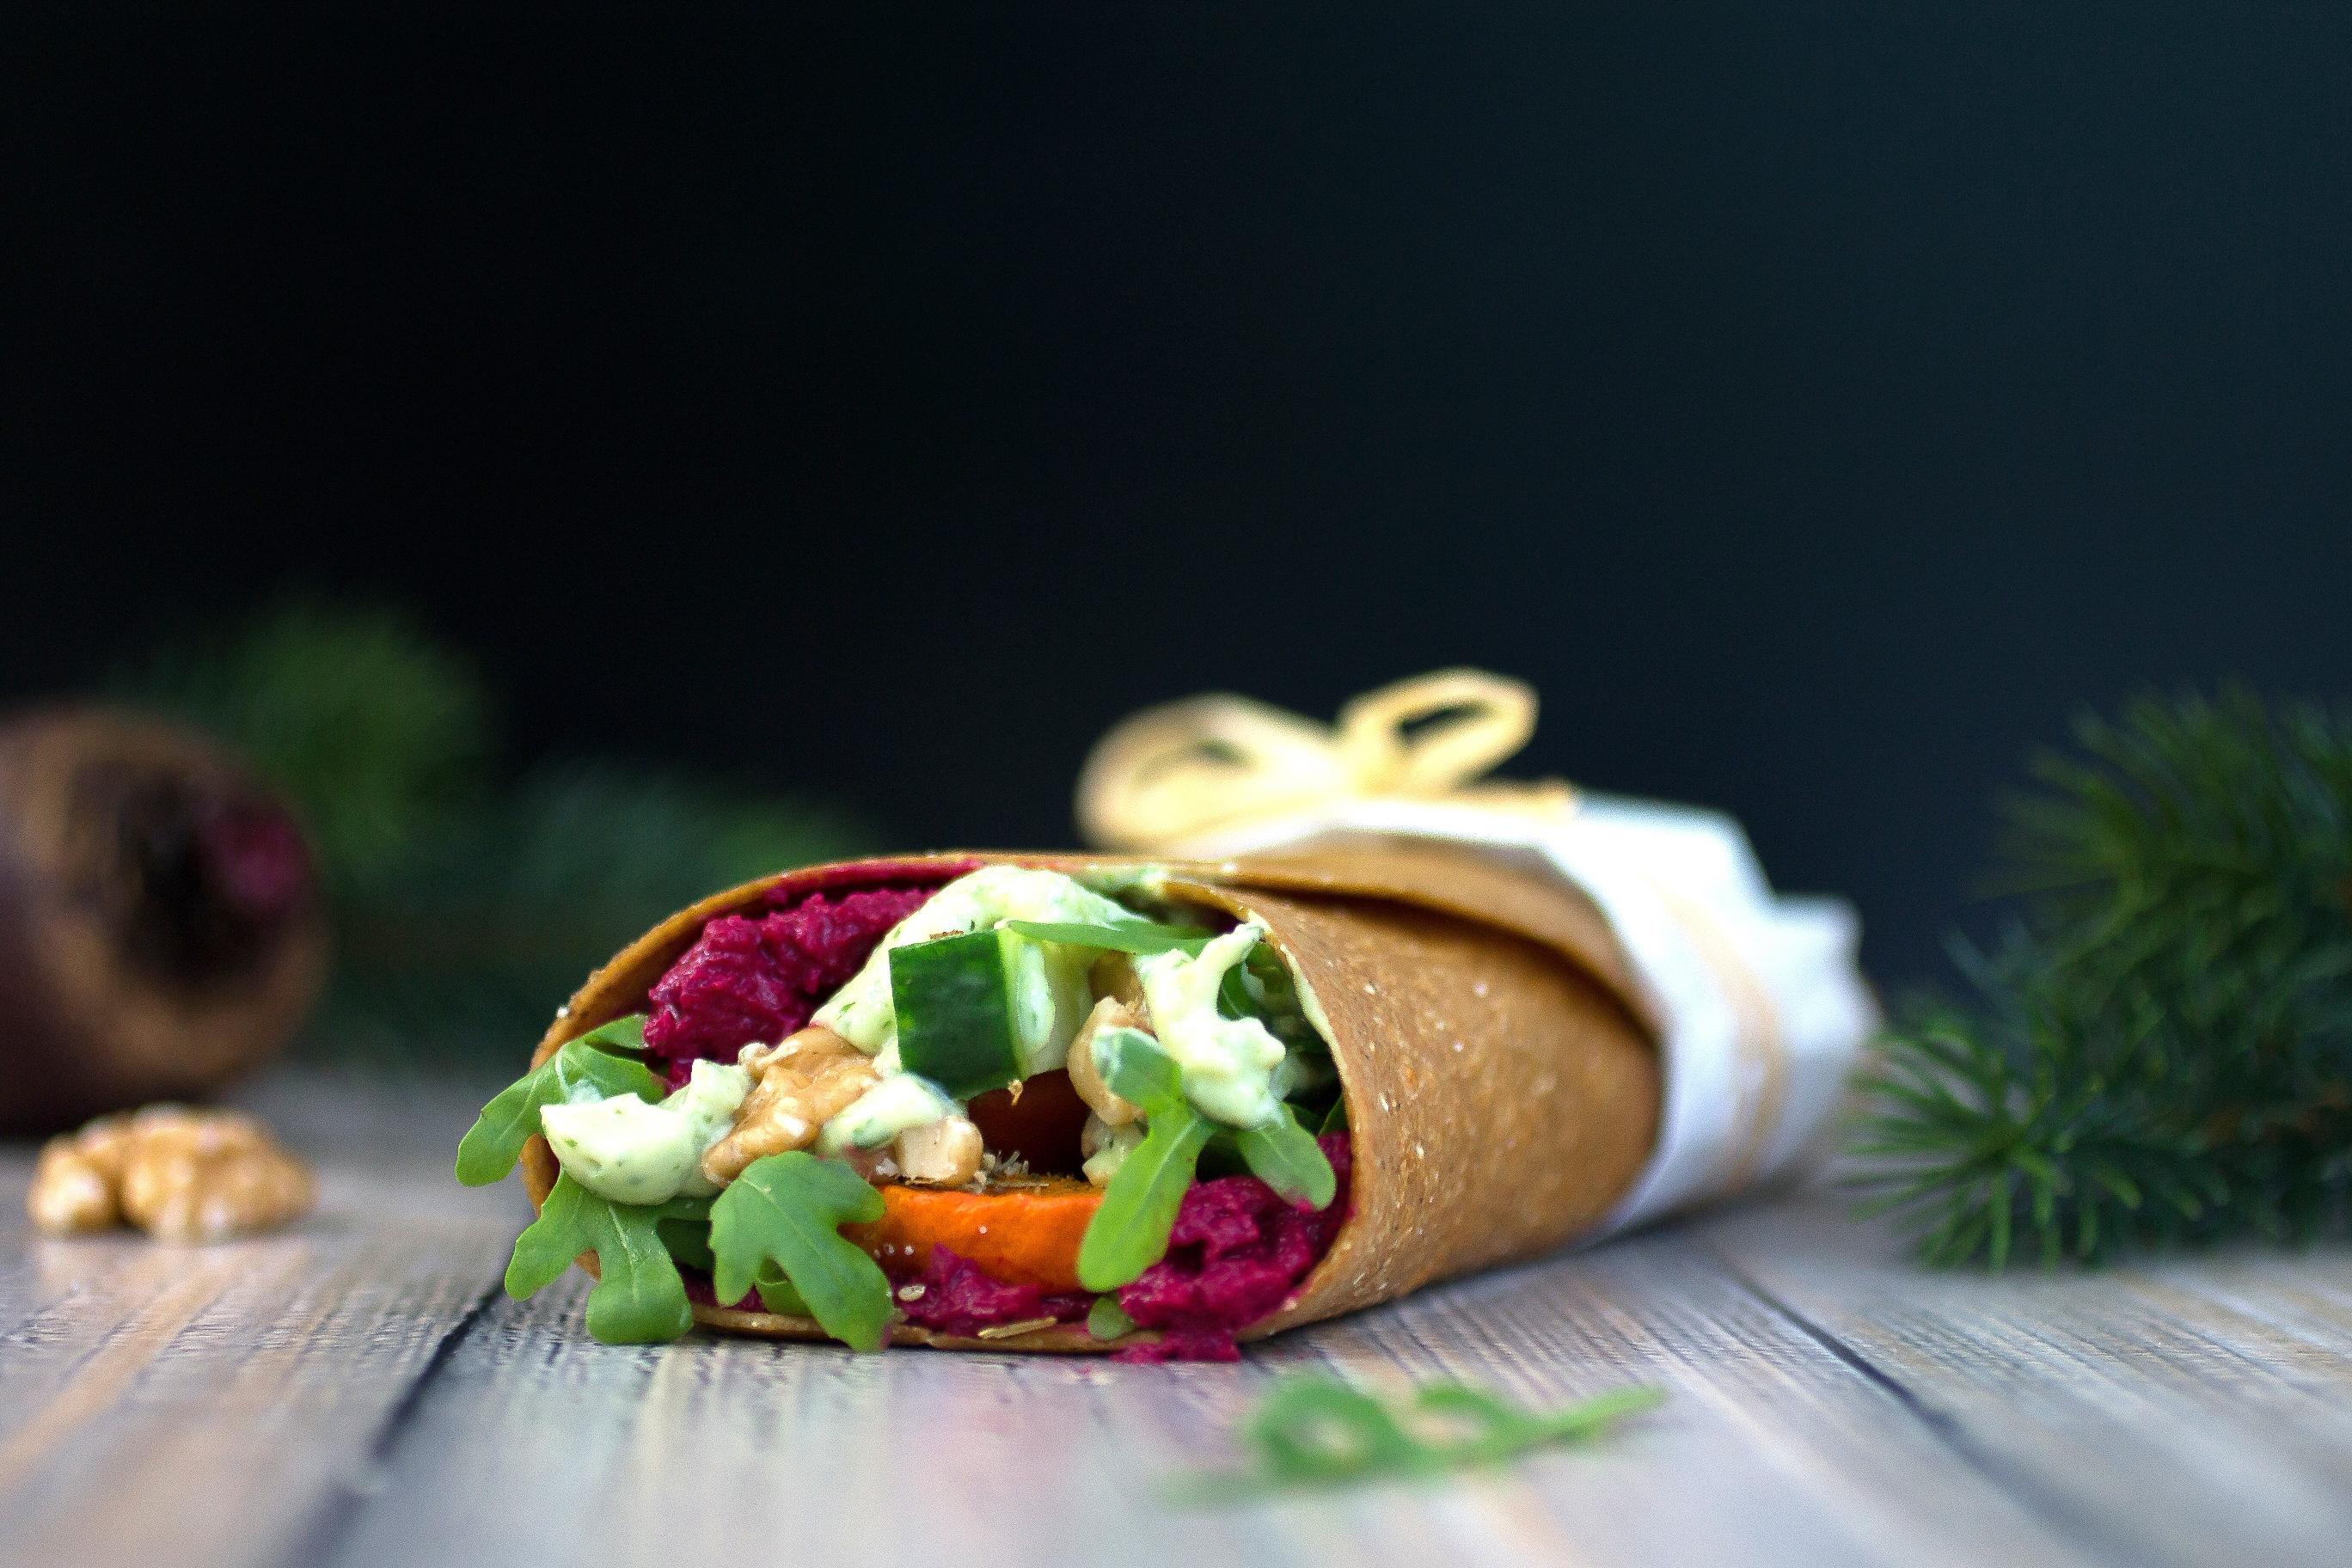 Lowcarb-Wraps mit gebackenem Kürbis, Avocadocreme und Hummus